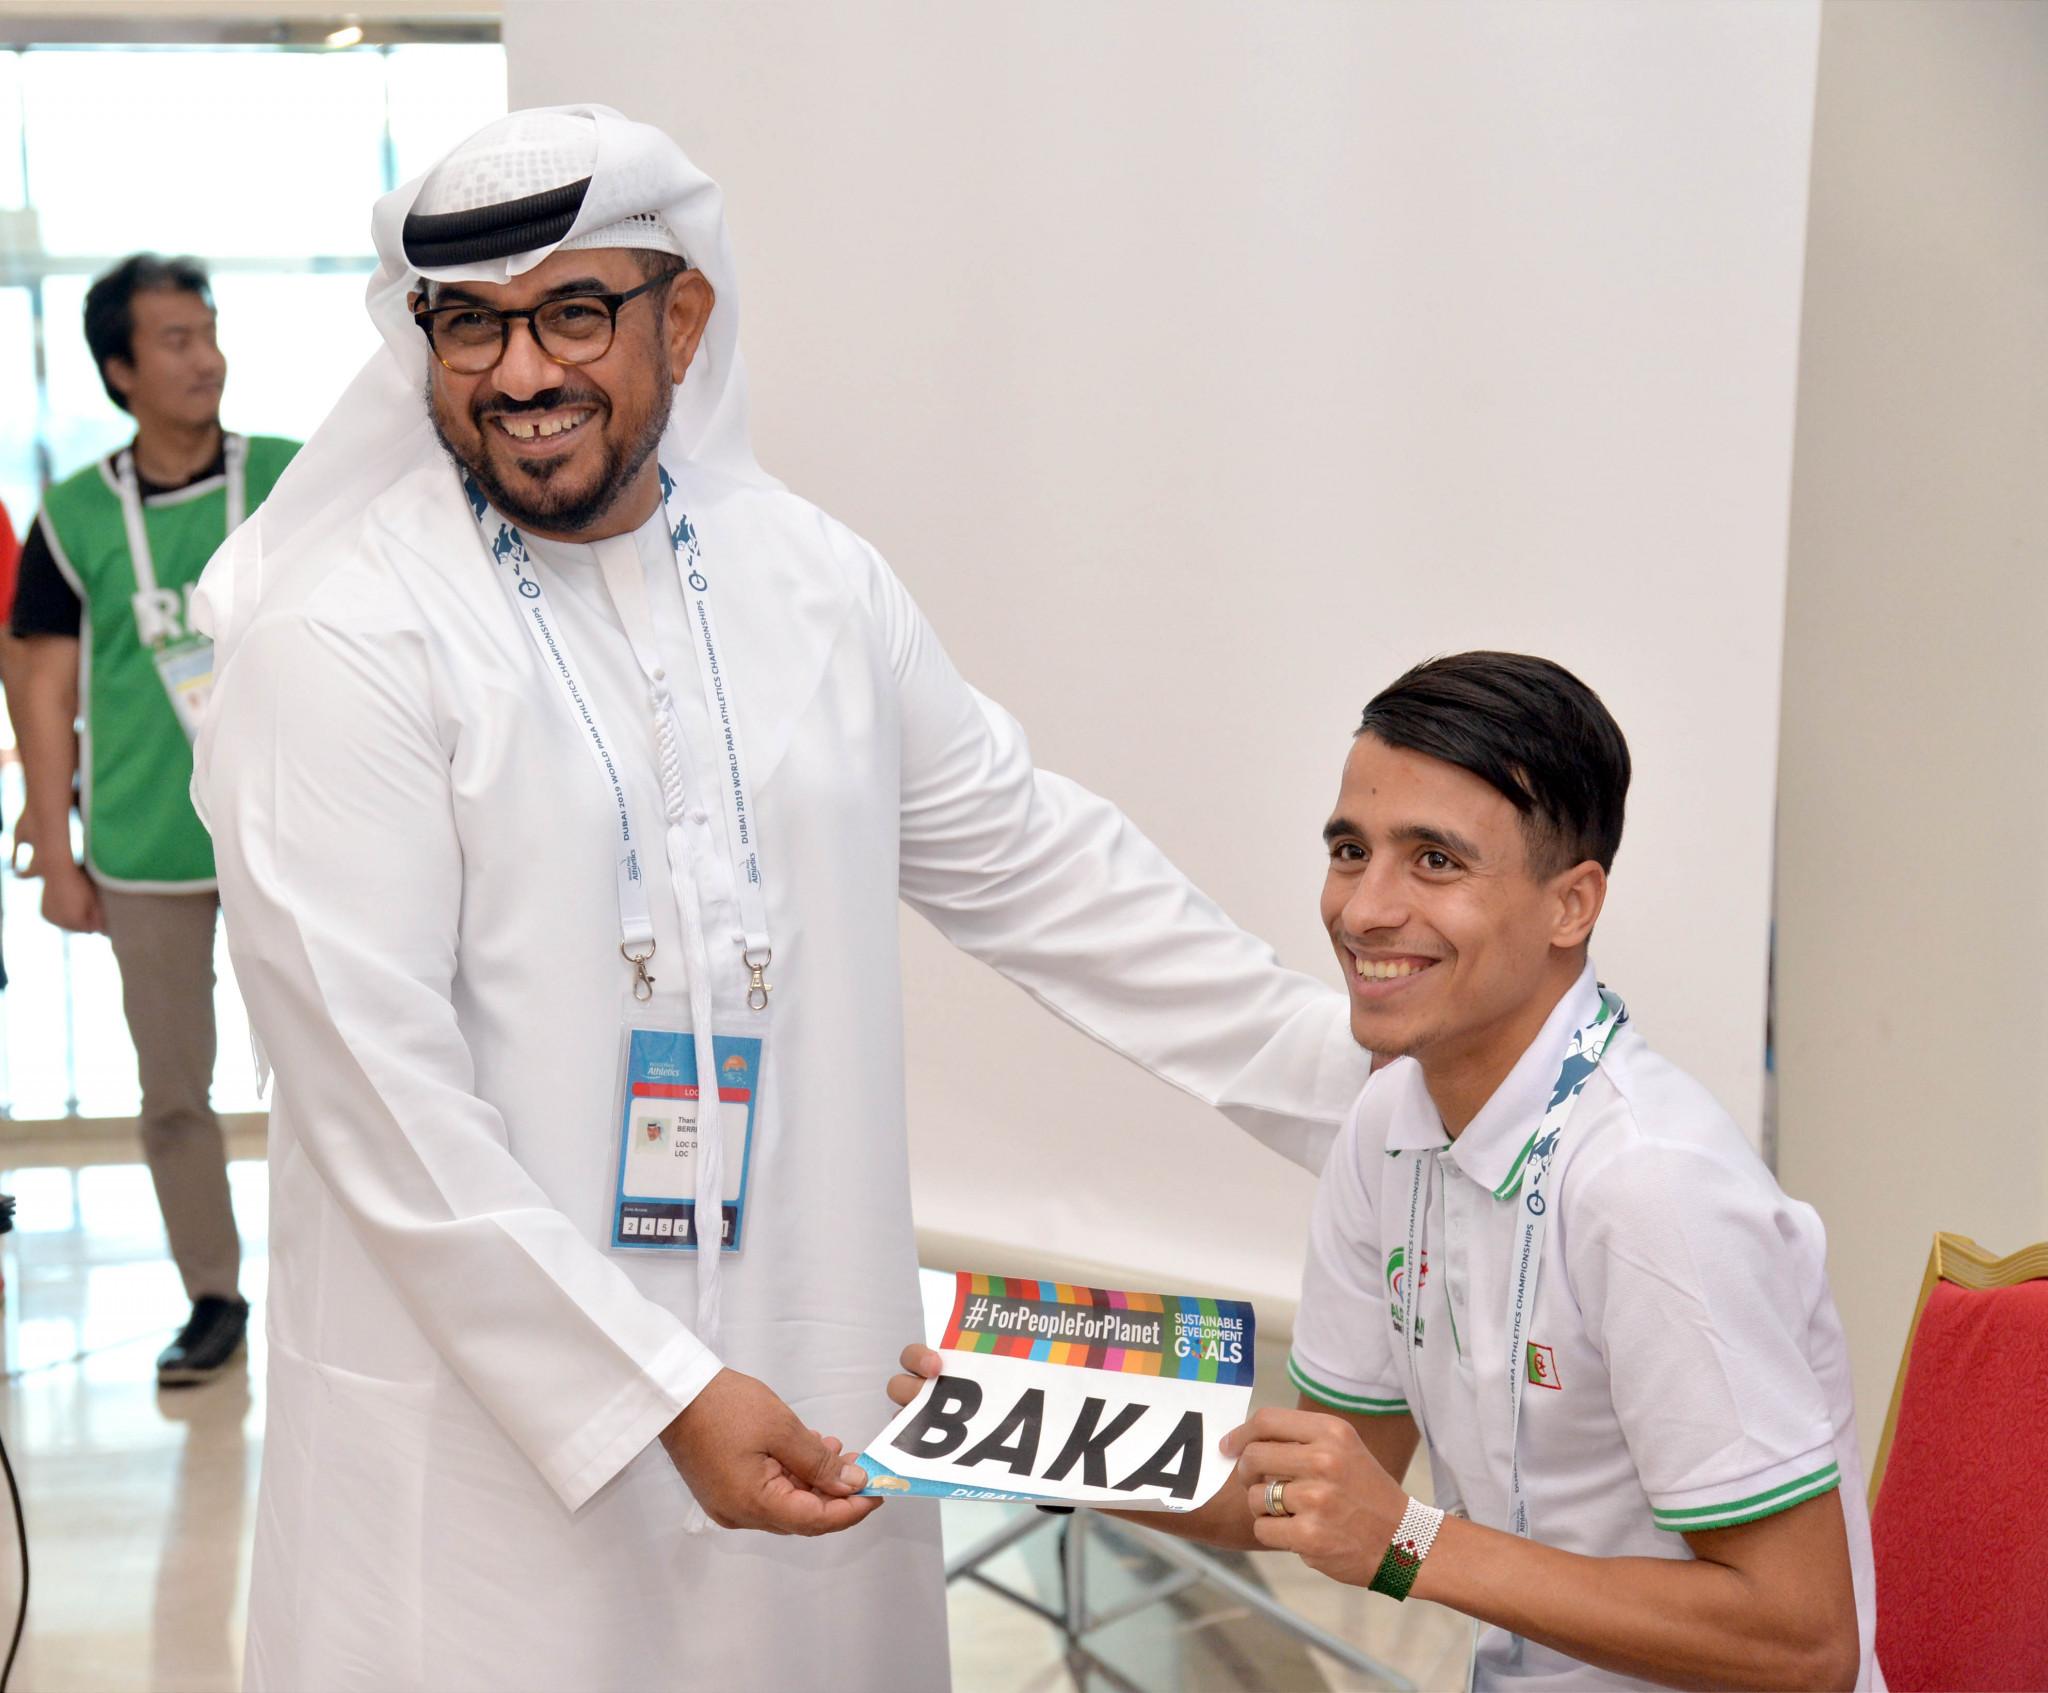 Algerian runner Abdellatif Baka received his bib from Dubai 2019 Organising Committee chairman, Thani Juma Berregad ©Dubai 2019